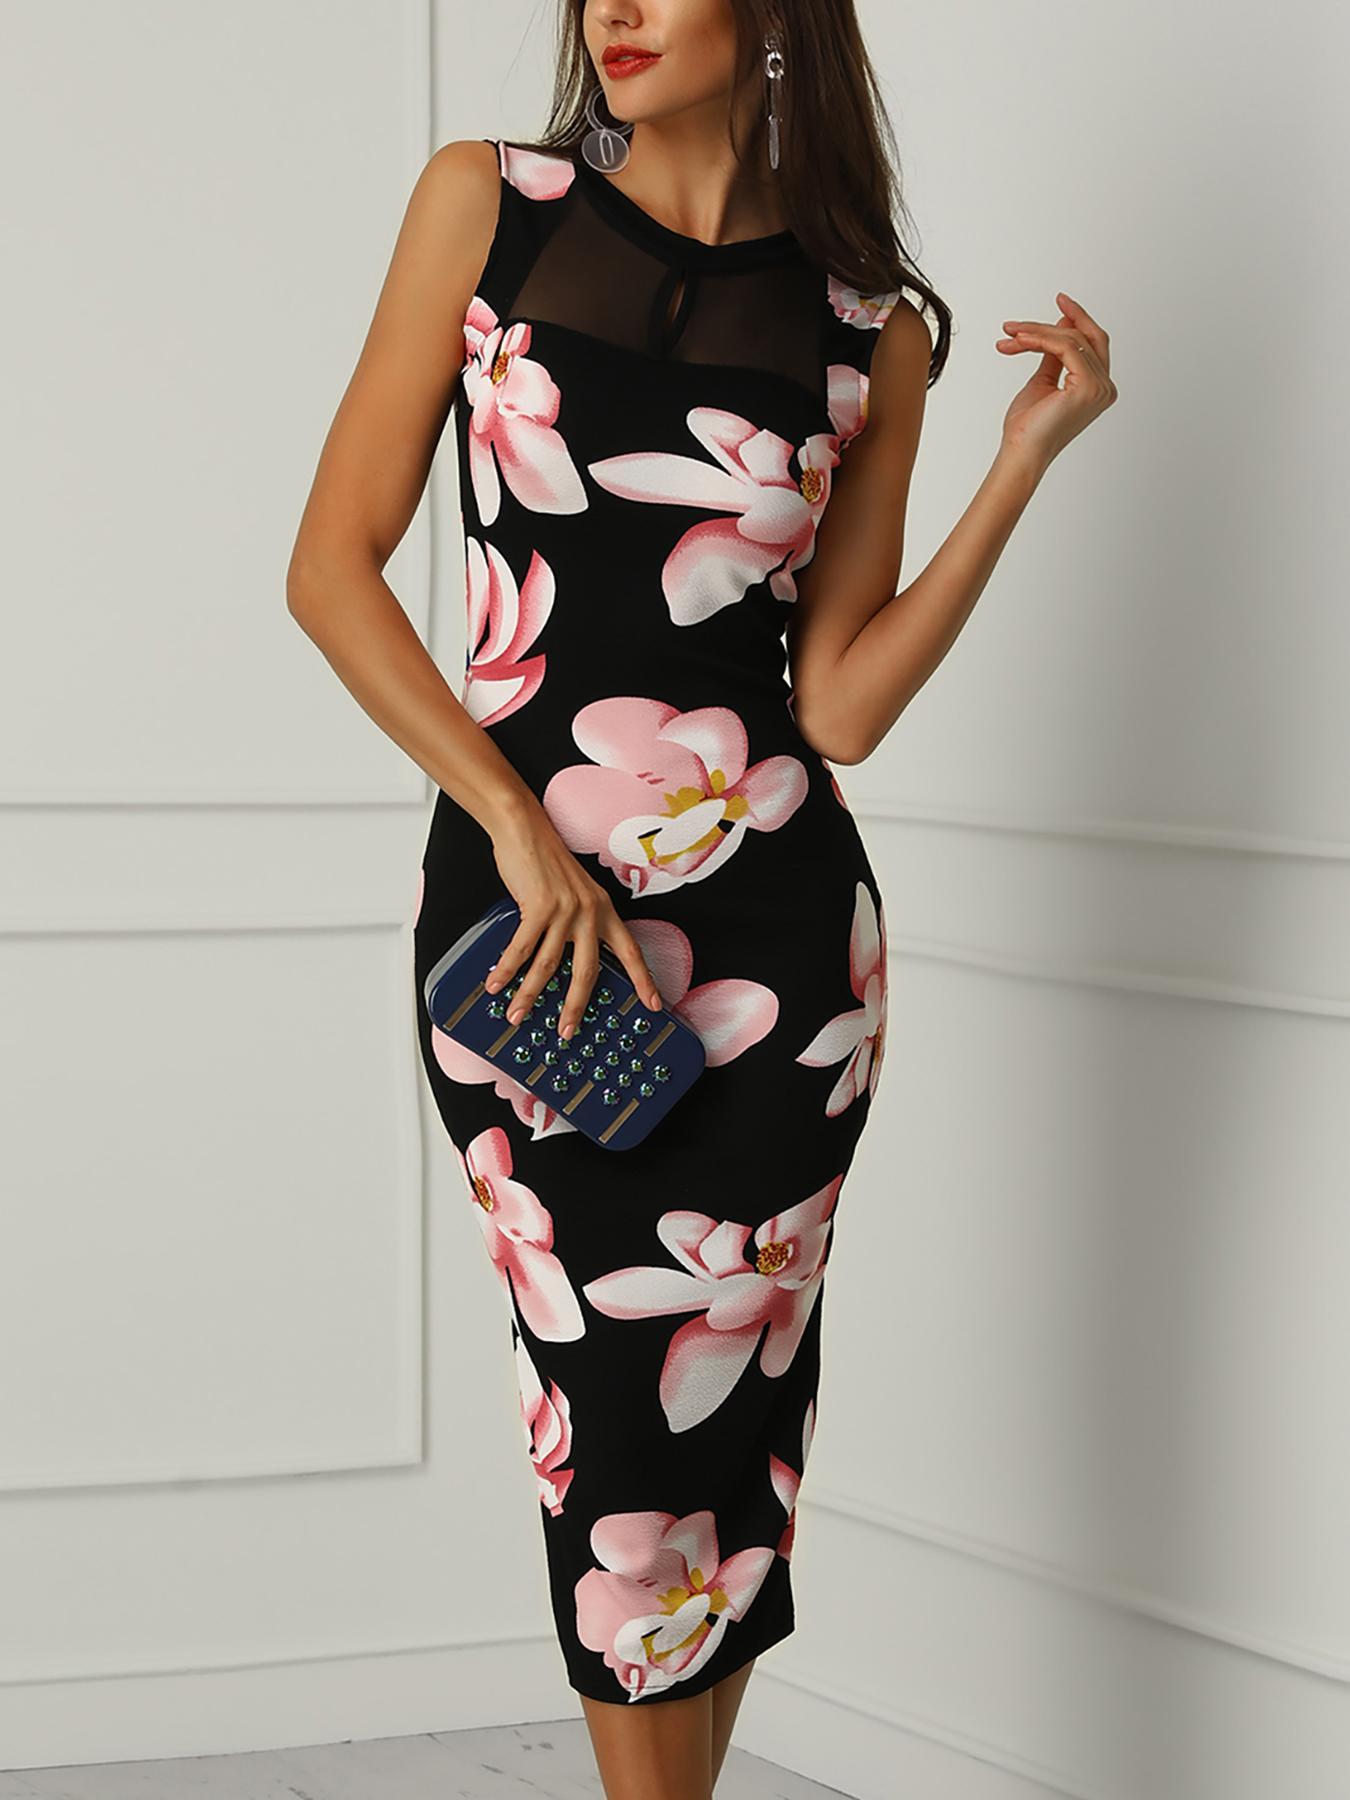 Floral Print Mesh Splicing Slit Dress